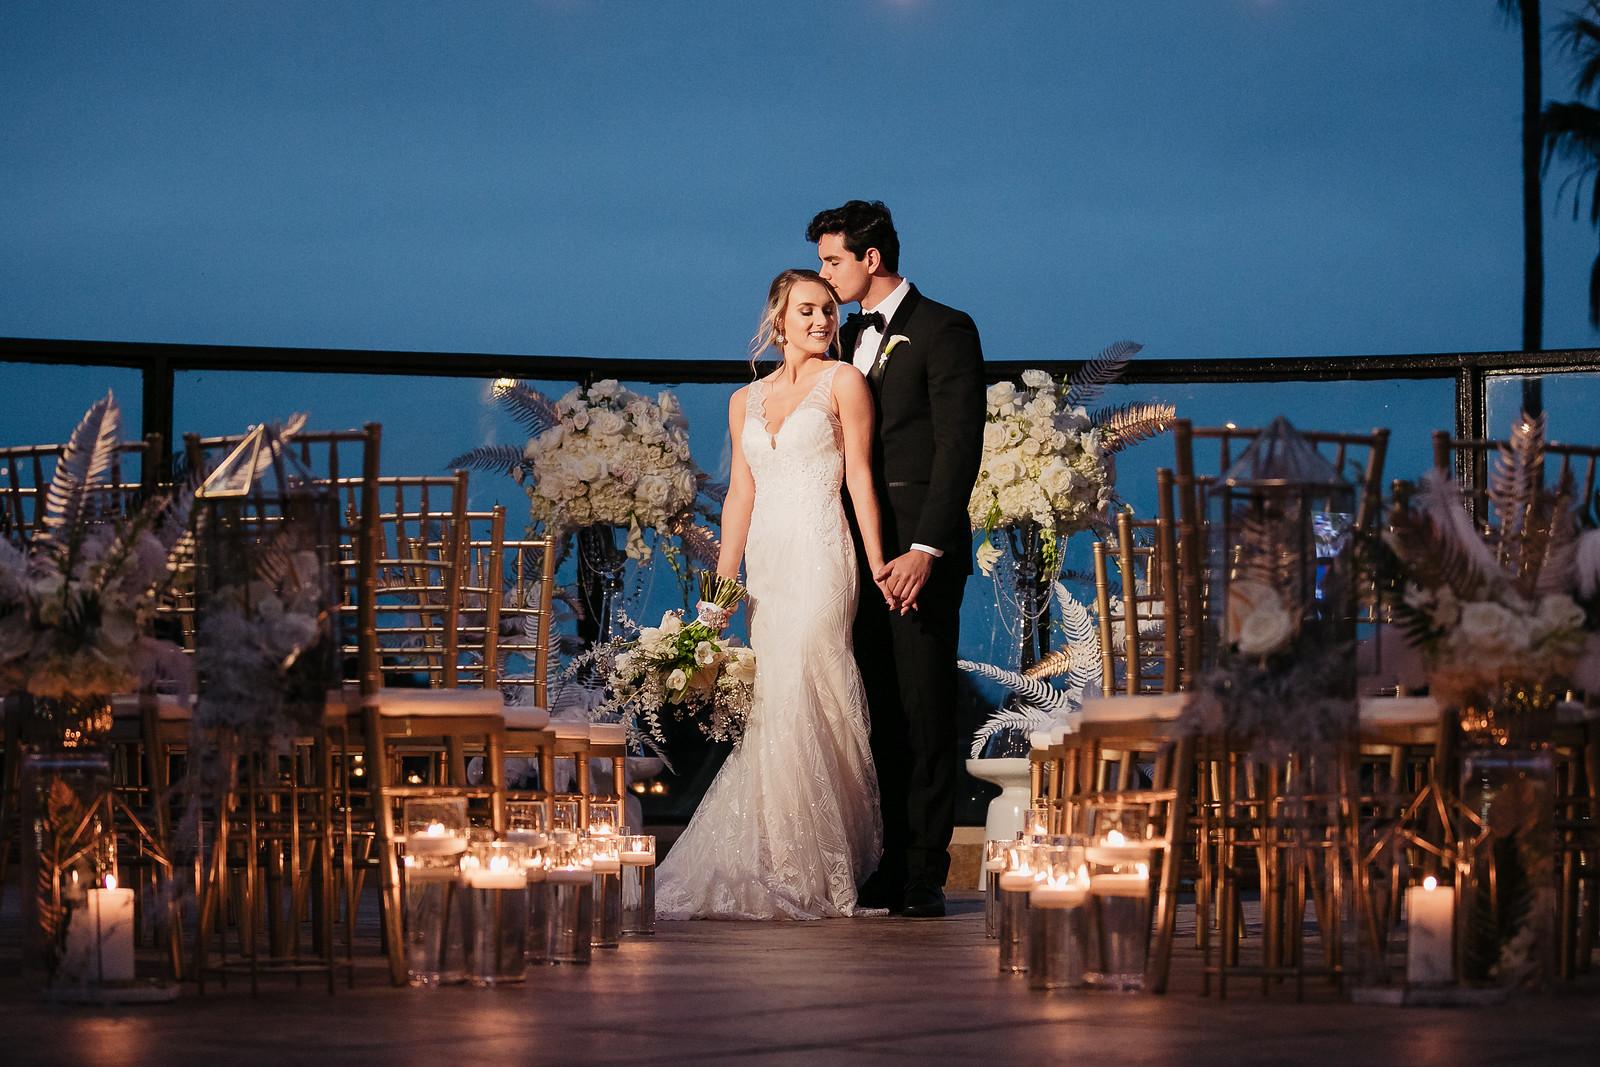 Sea-Cliffe-Country-Club-Huntington-Beach-Wedding-Photography 144-X3.jpg